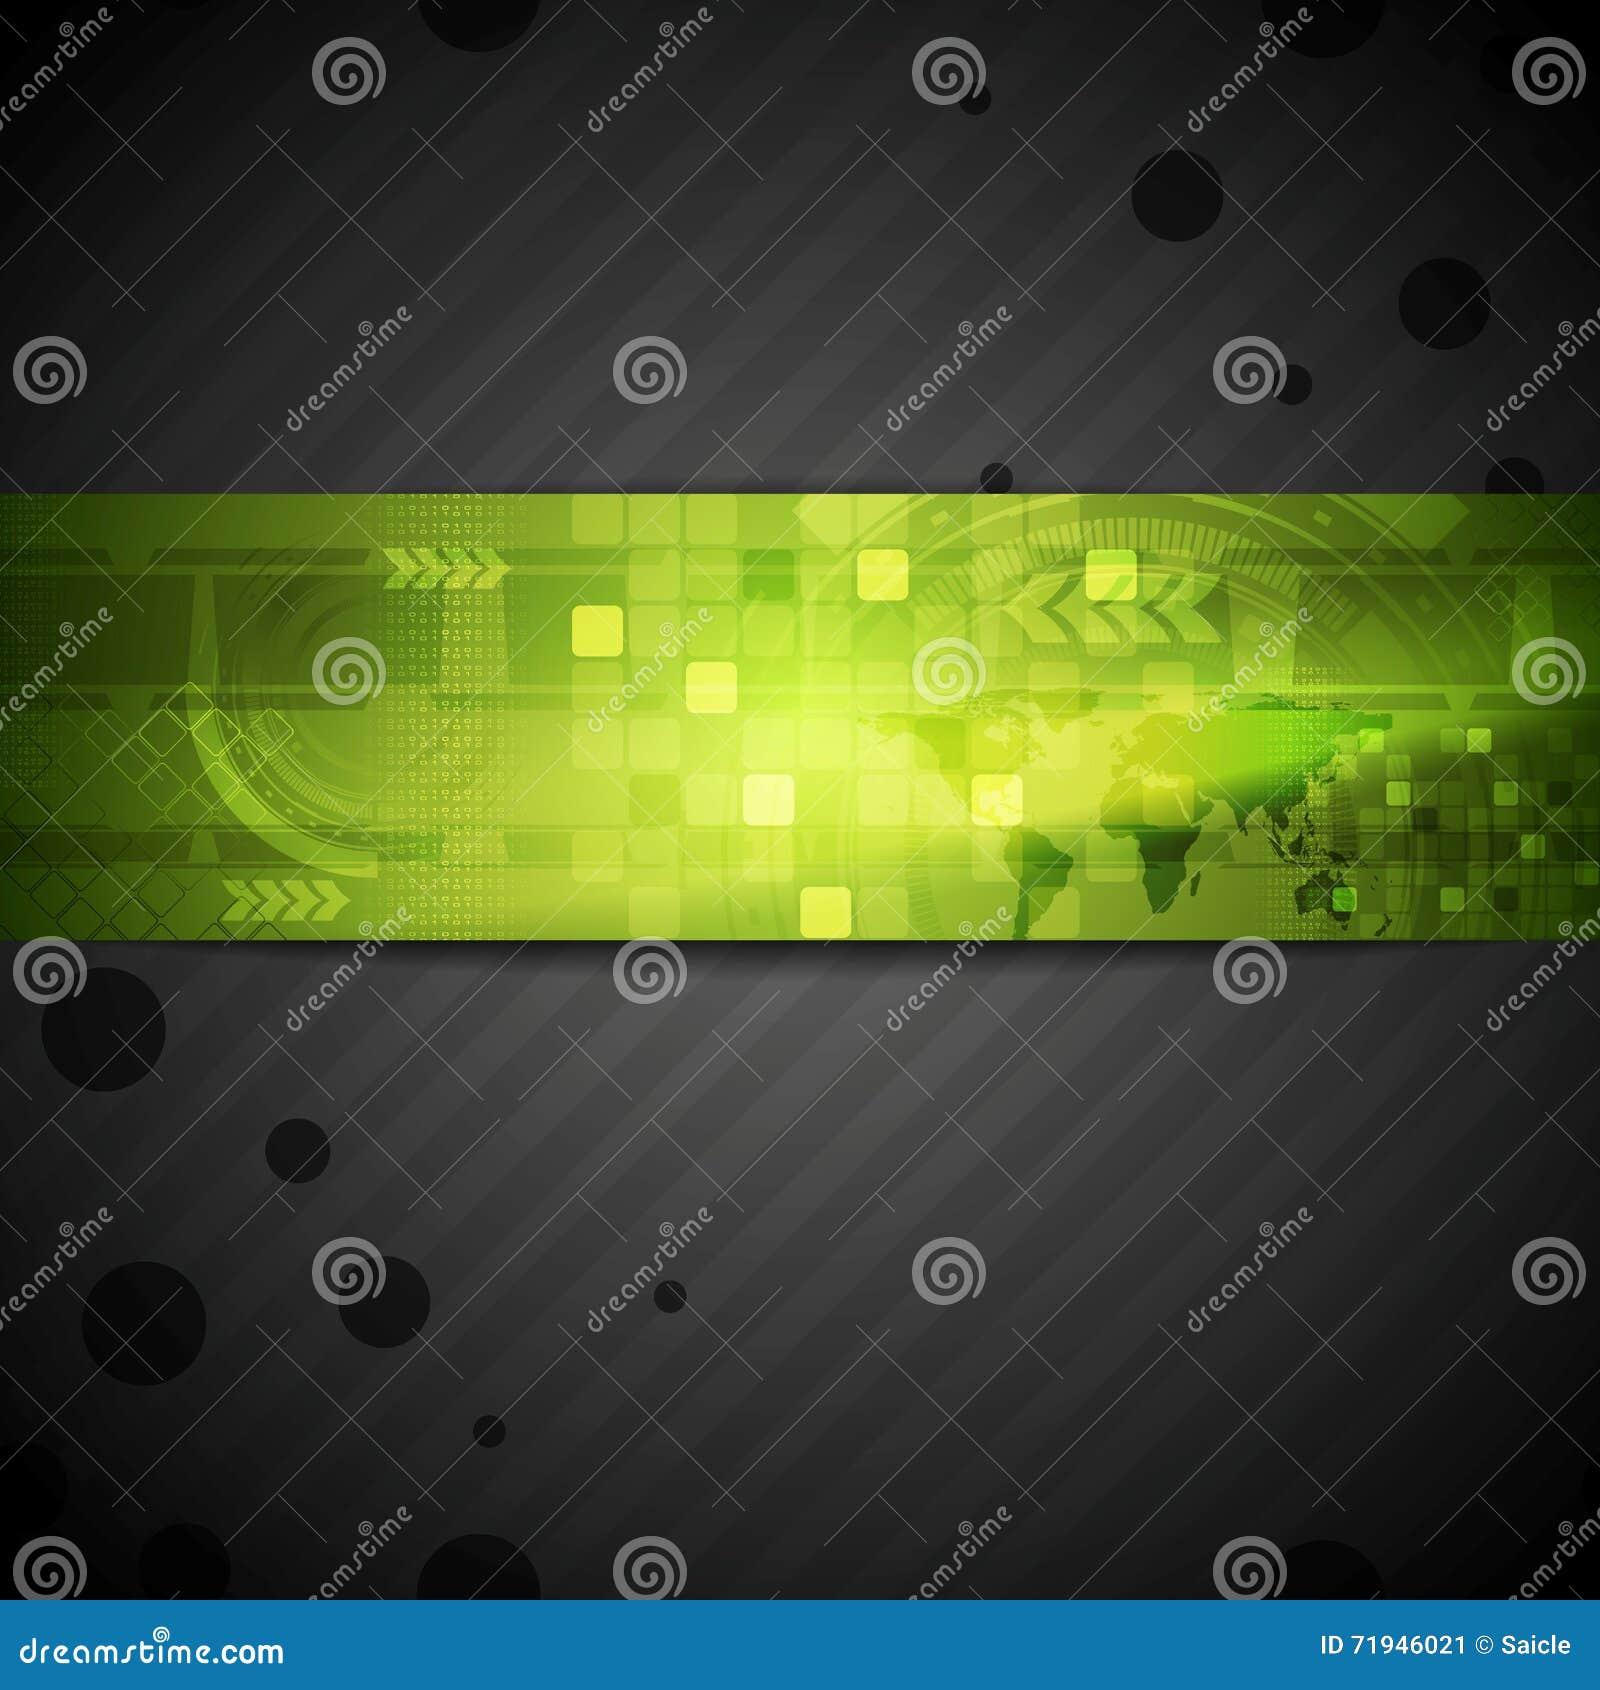 brochure tech template with green banner element stock vector illustration of backdrop. Black Bedroom Furniture Sets. Home Design Ideas